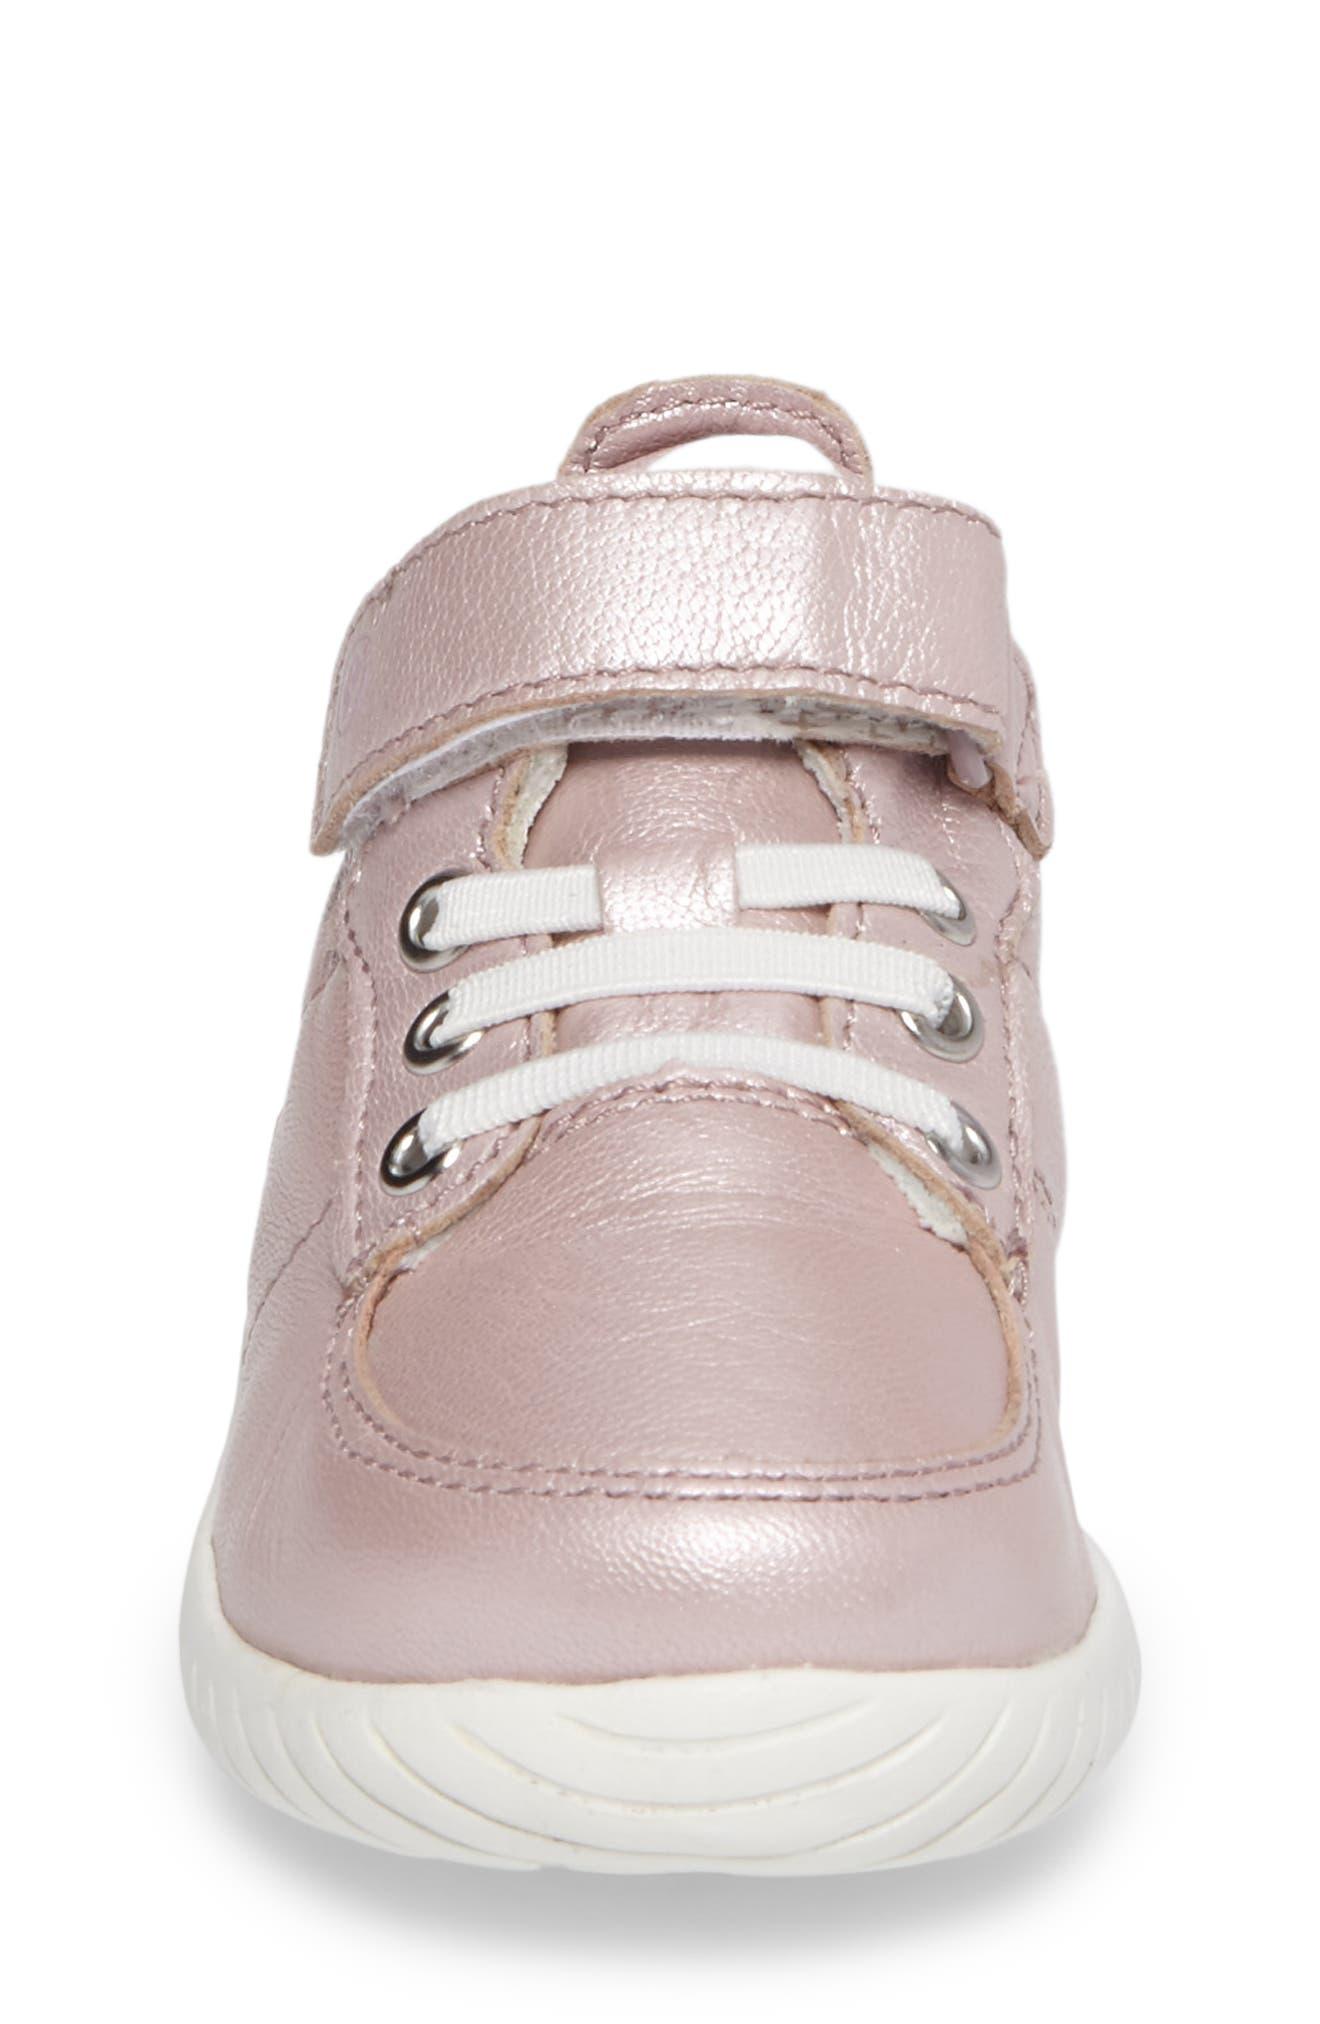 Bailey High Top Sneaker,                             Alternate thumbnail 4, color,                             PINK METALLIC